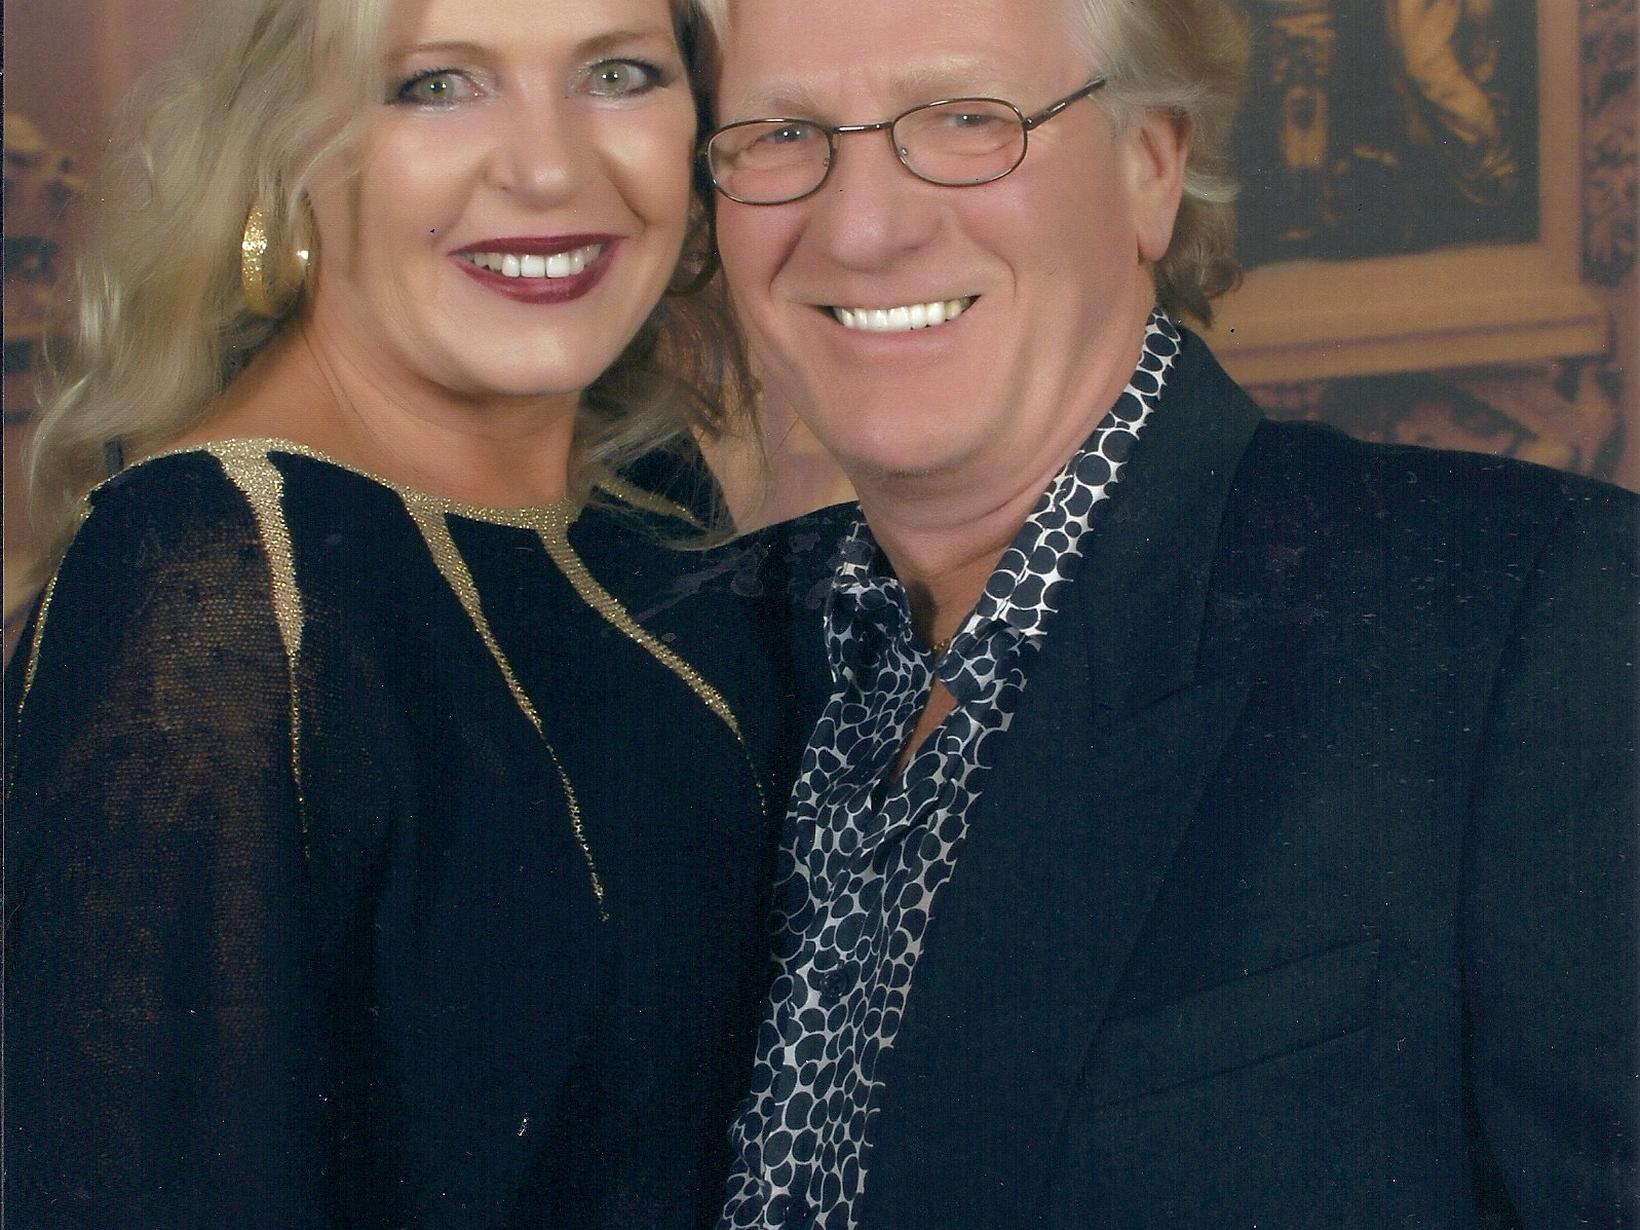 Francine & David from Melbourne, Victoria, Australia